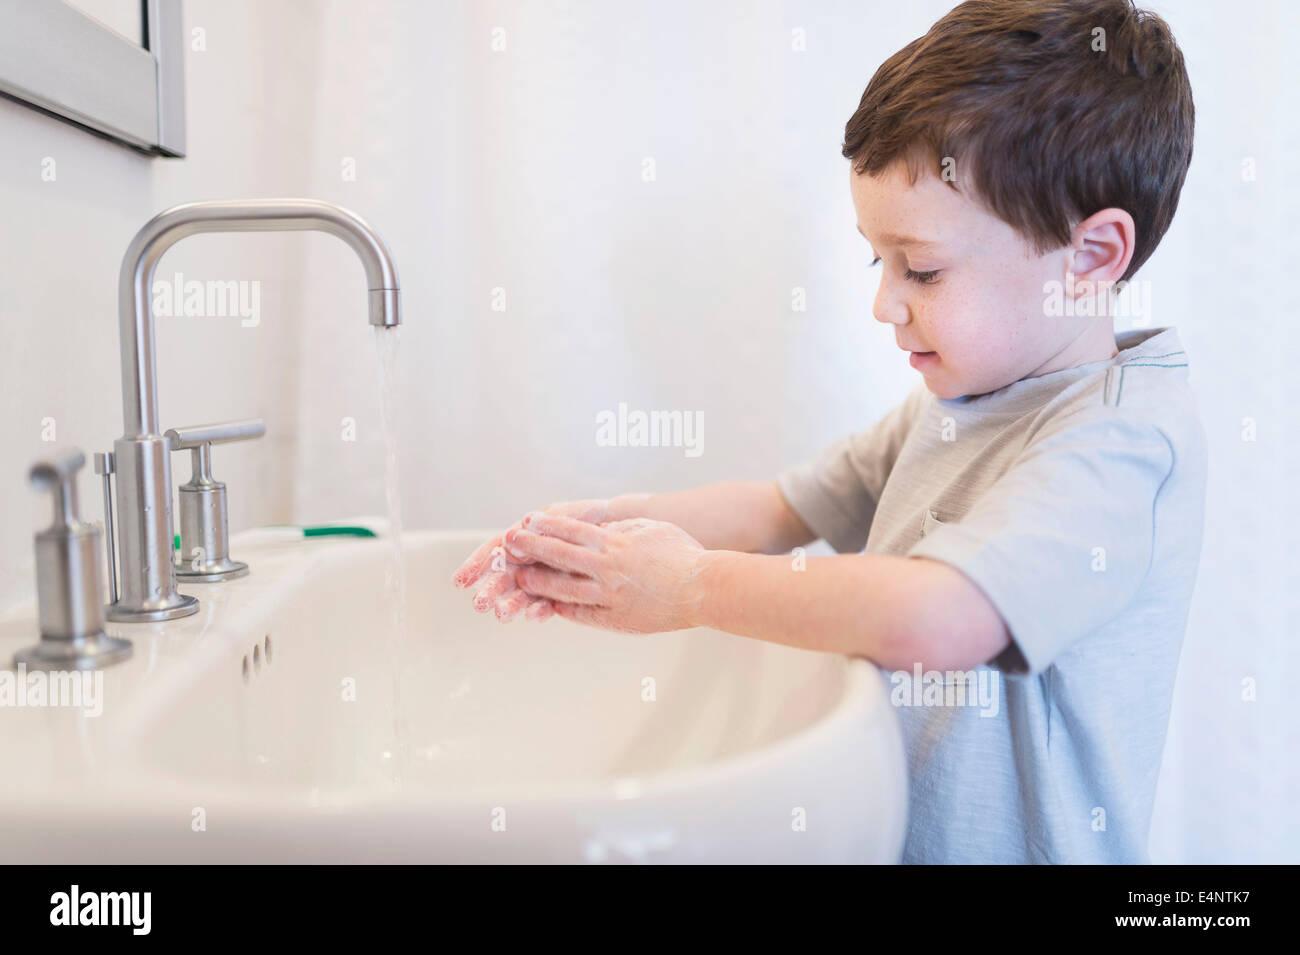 Boy (6-7) washing hands - Stock Image